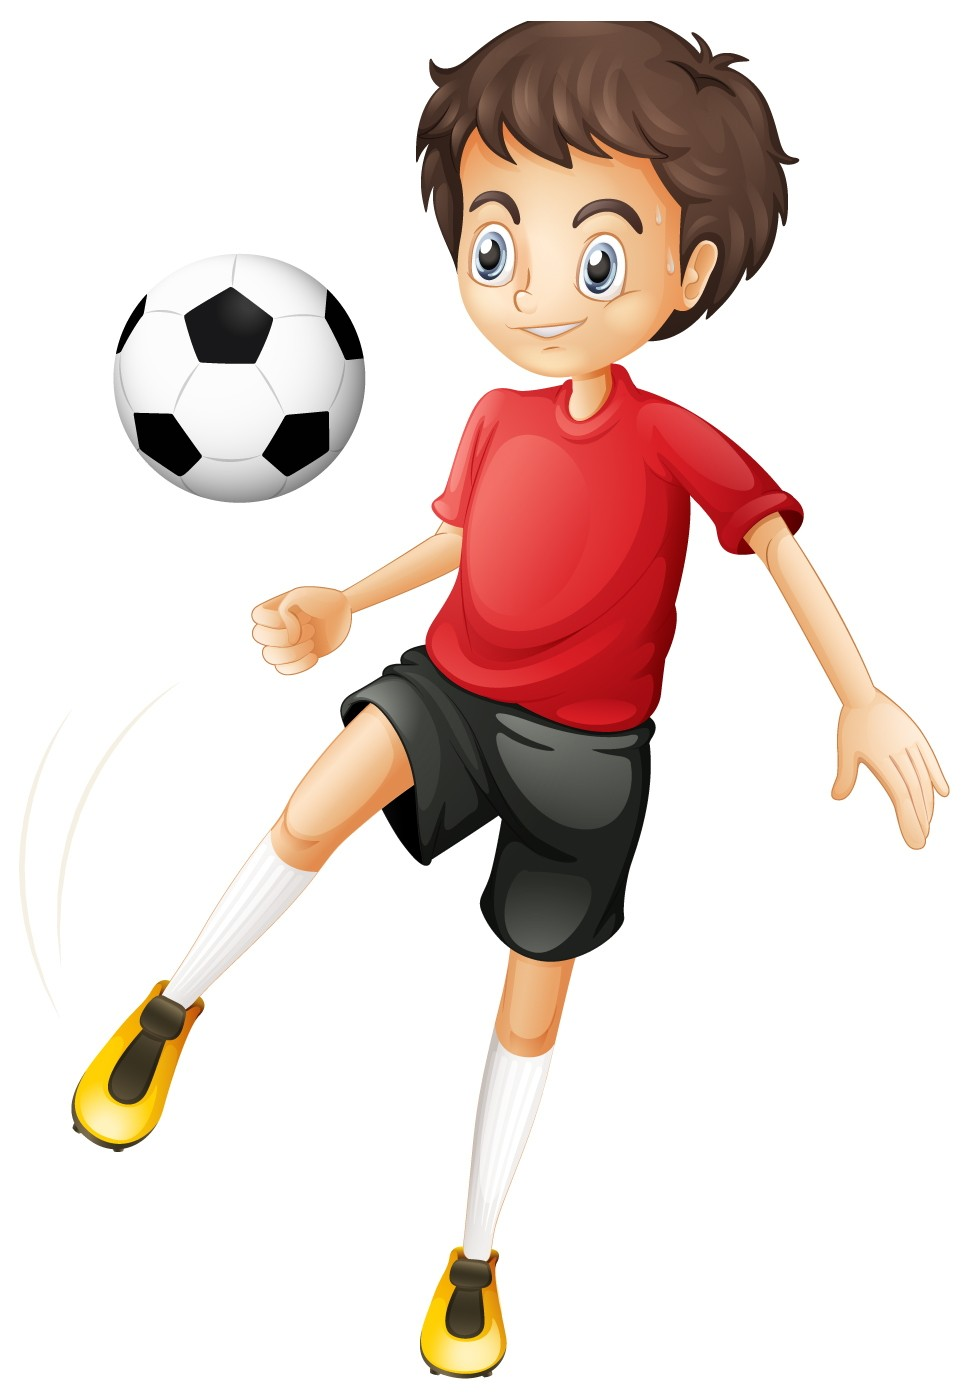 970x1400 Football Cartoon Good Kids Football Player